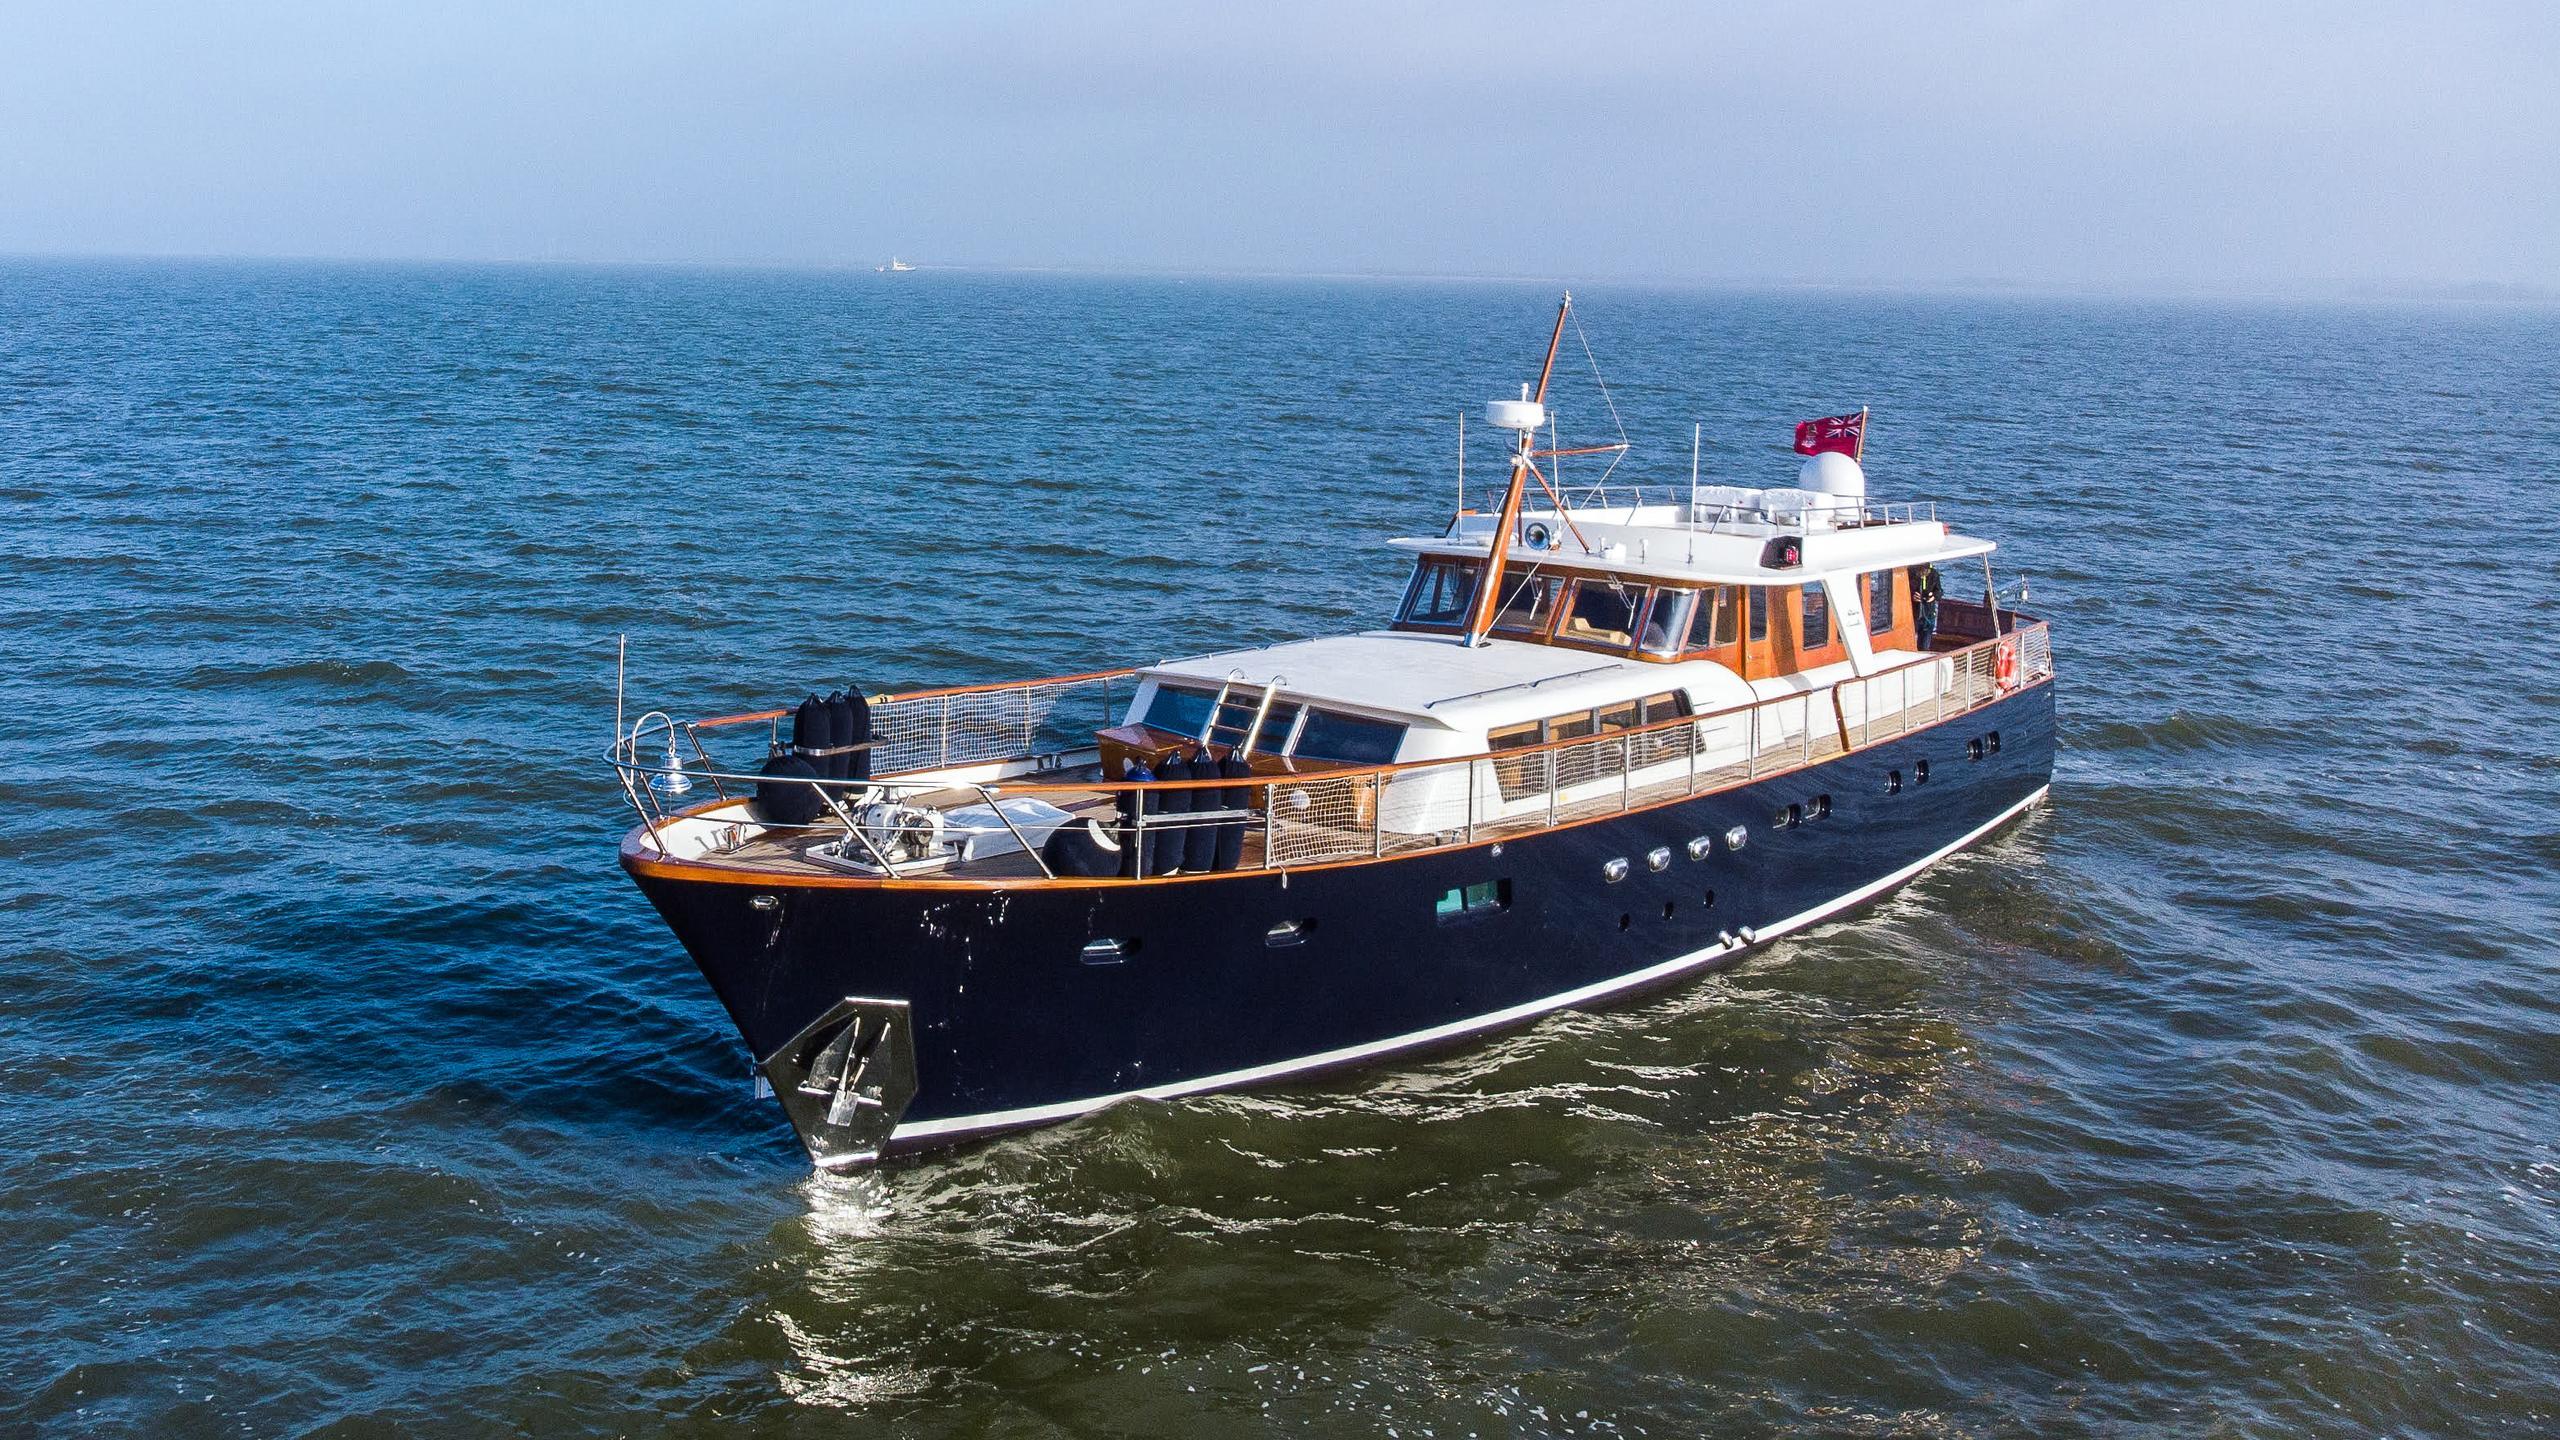 caravelle motoryacht feadship 24m 1965 half profile